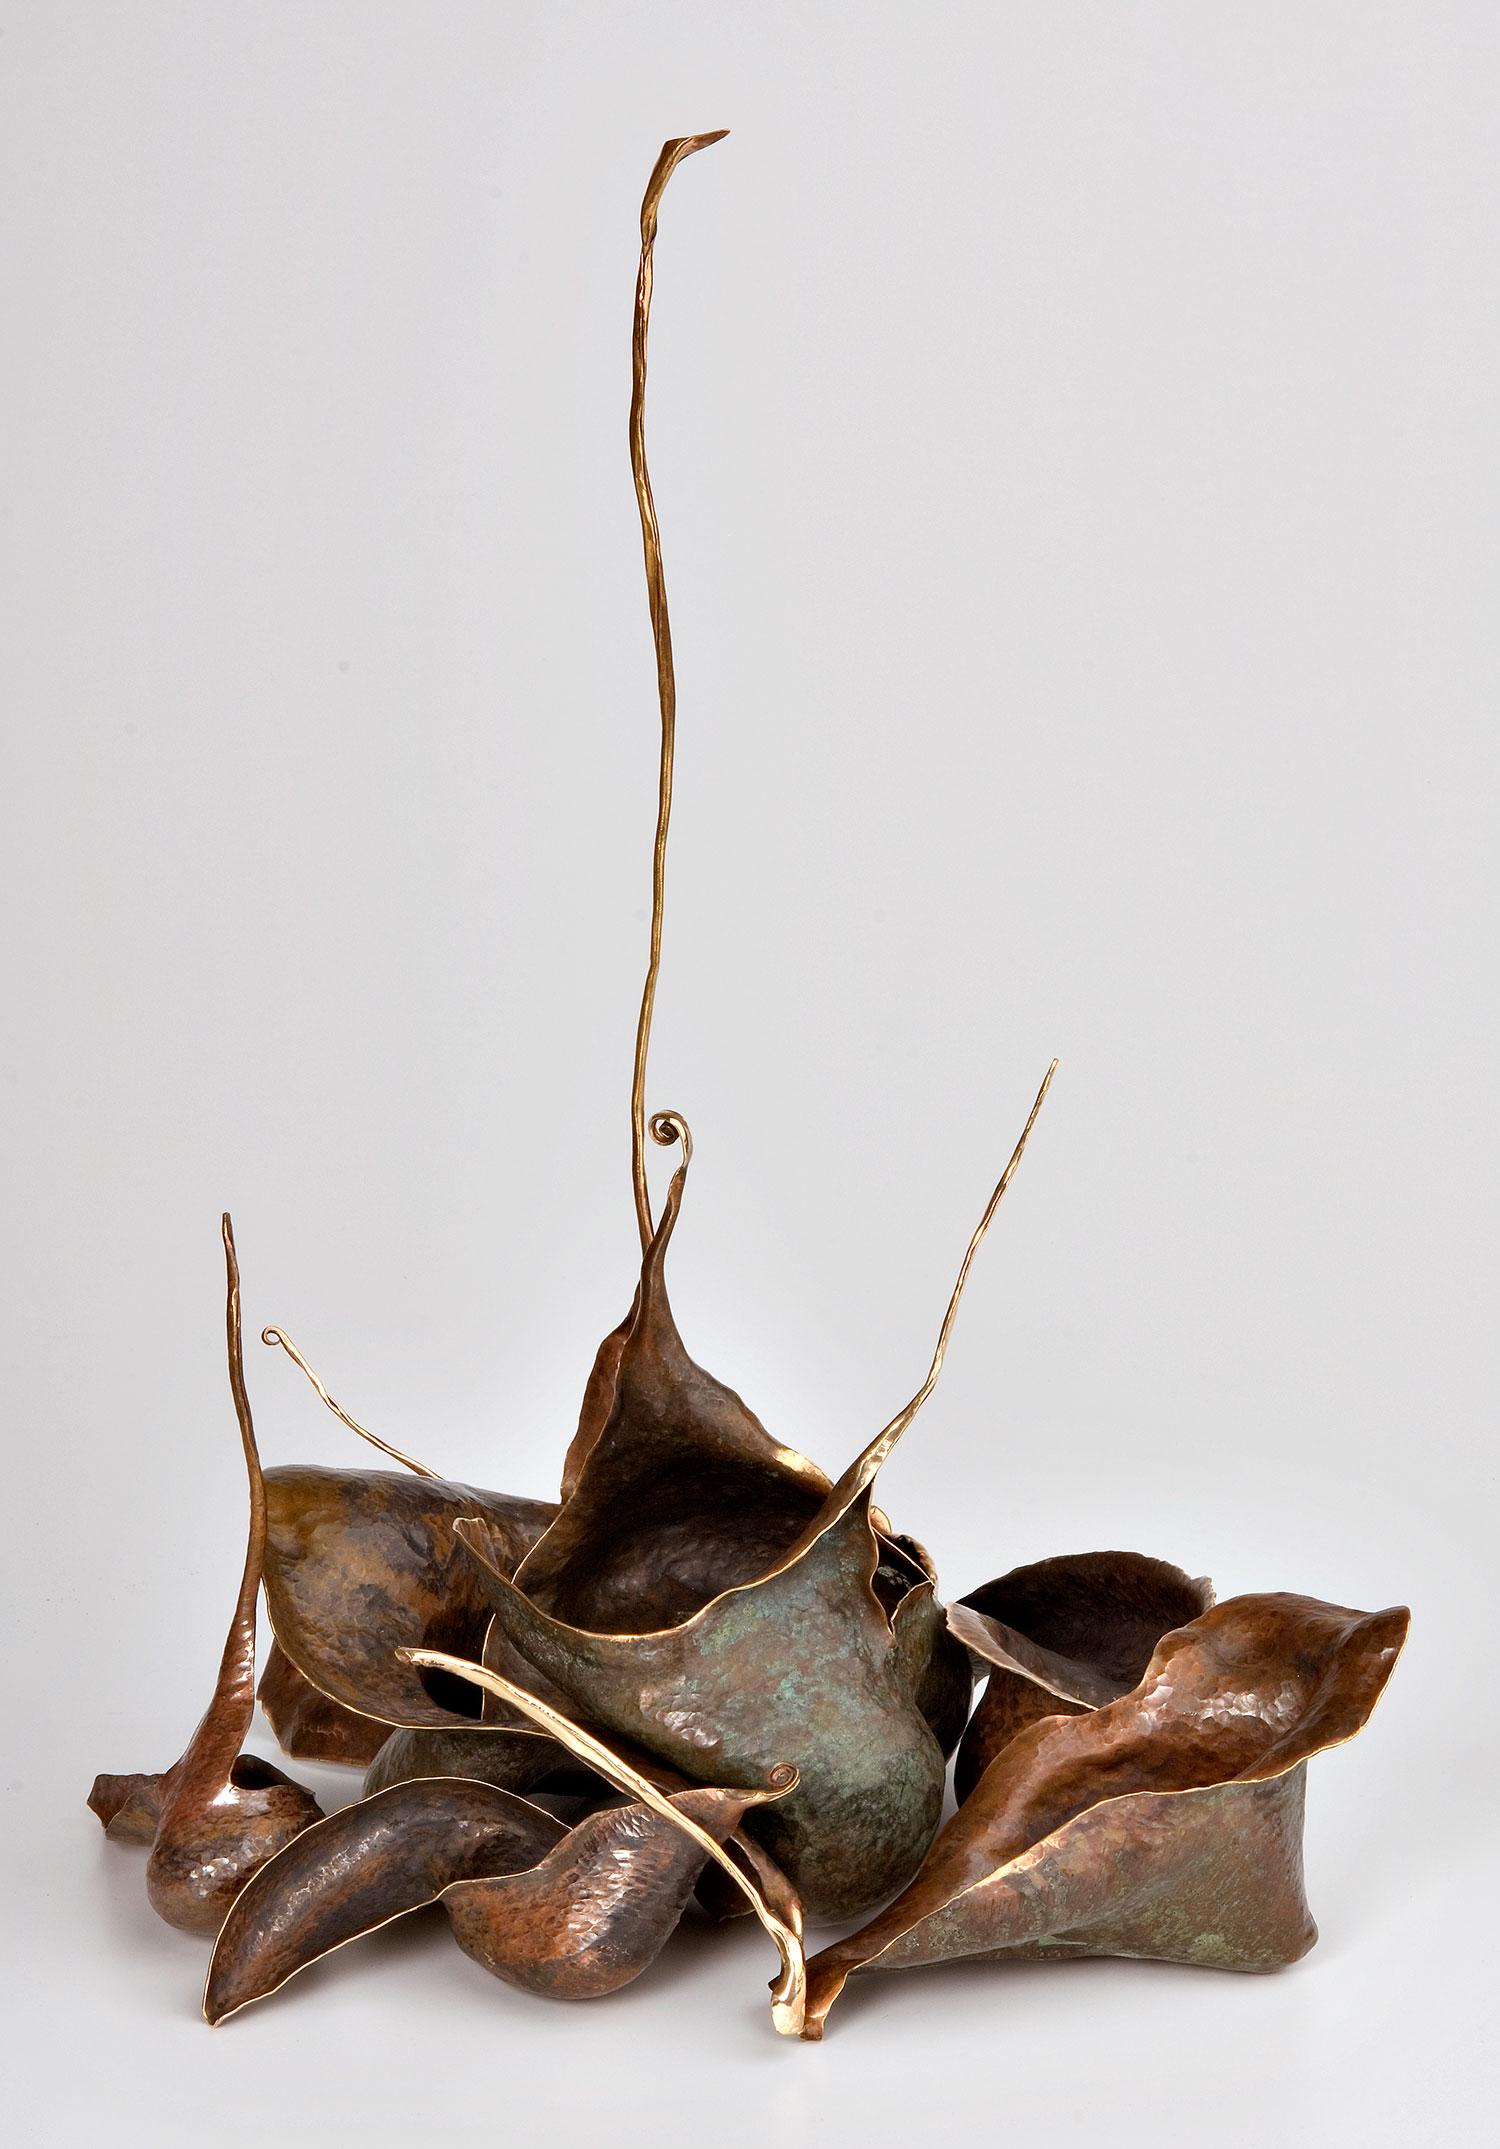 Nesting Nests (5 pieces)